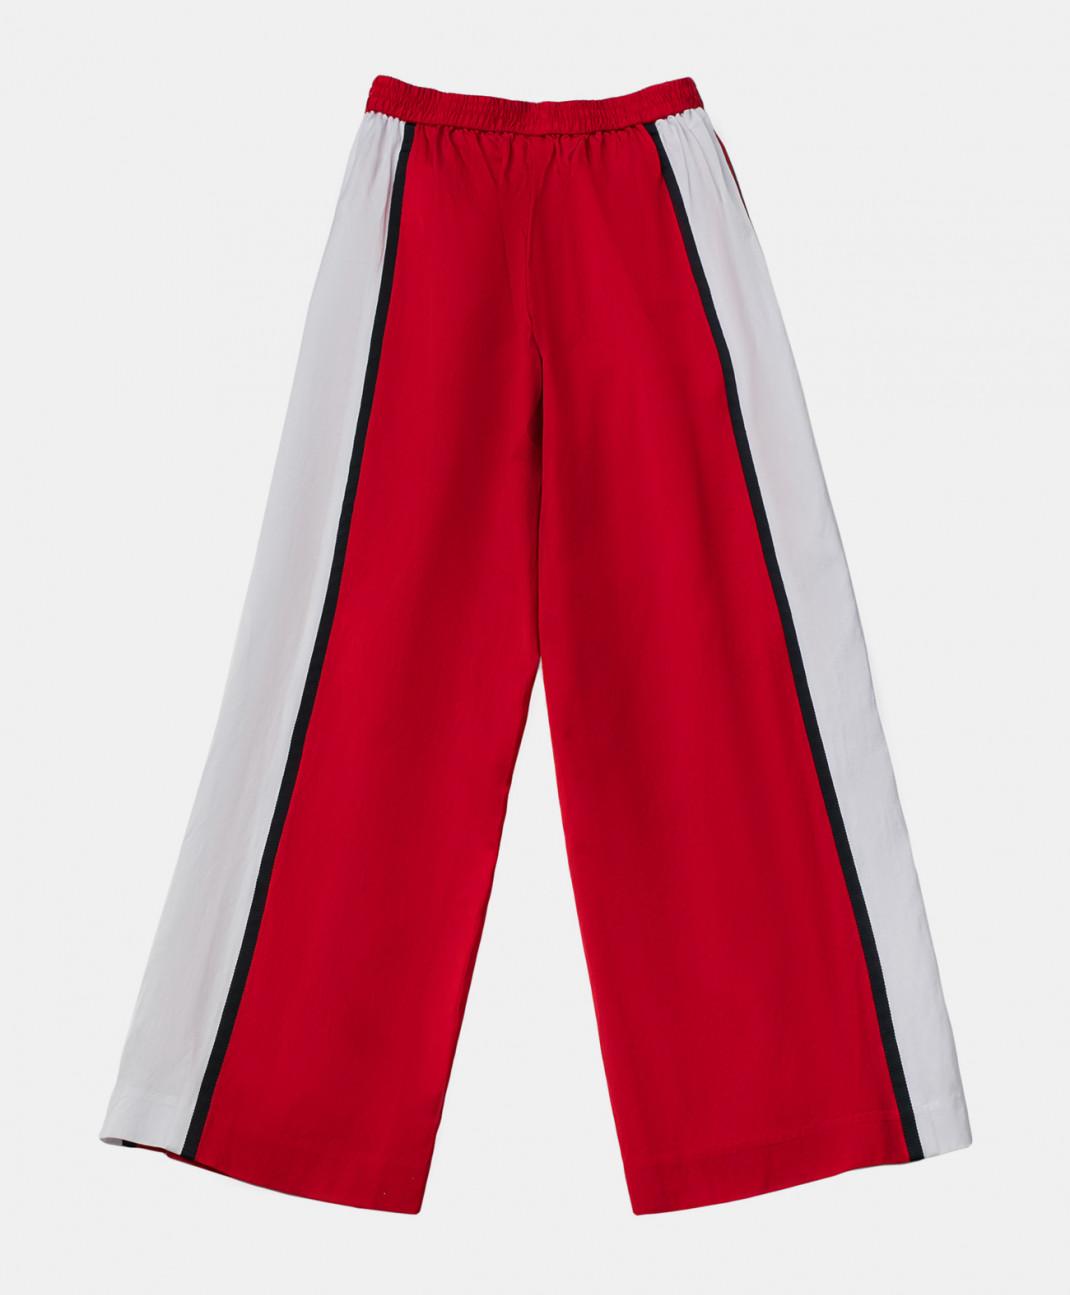 Gulliver Красные брюки с лампасами Gulliver